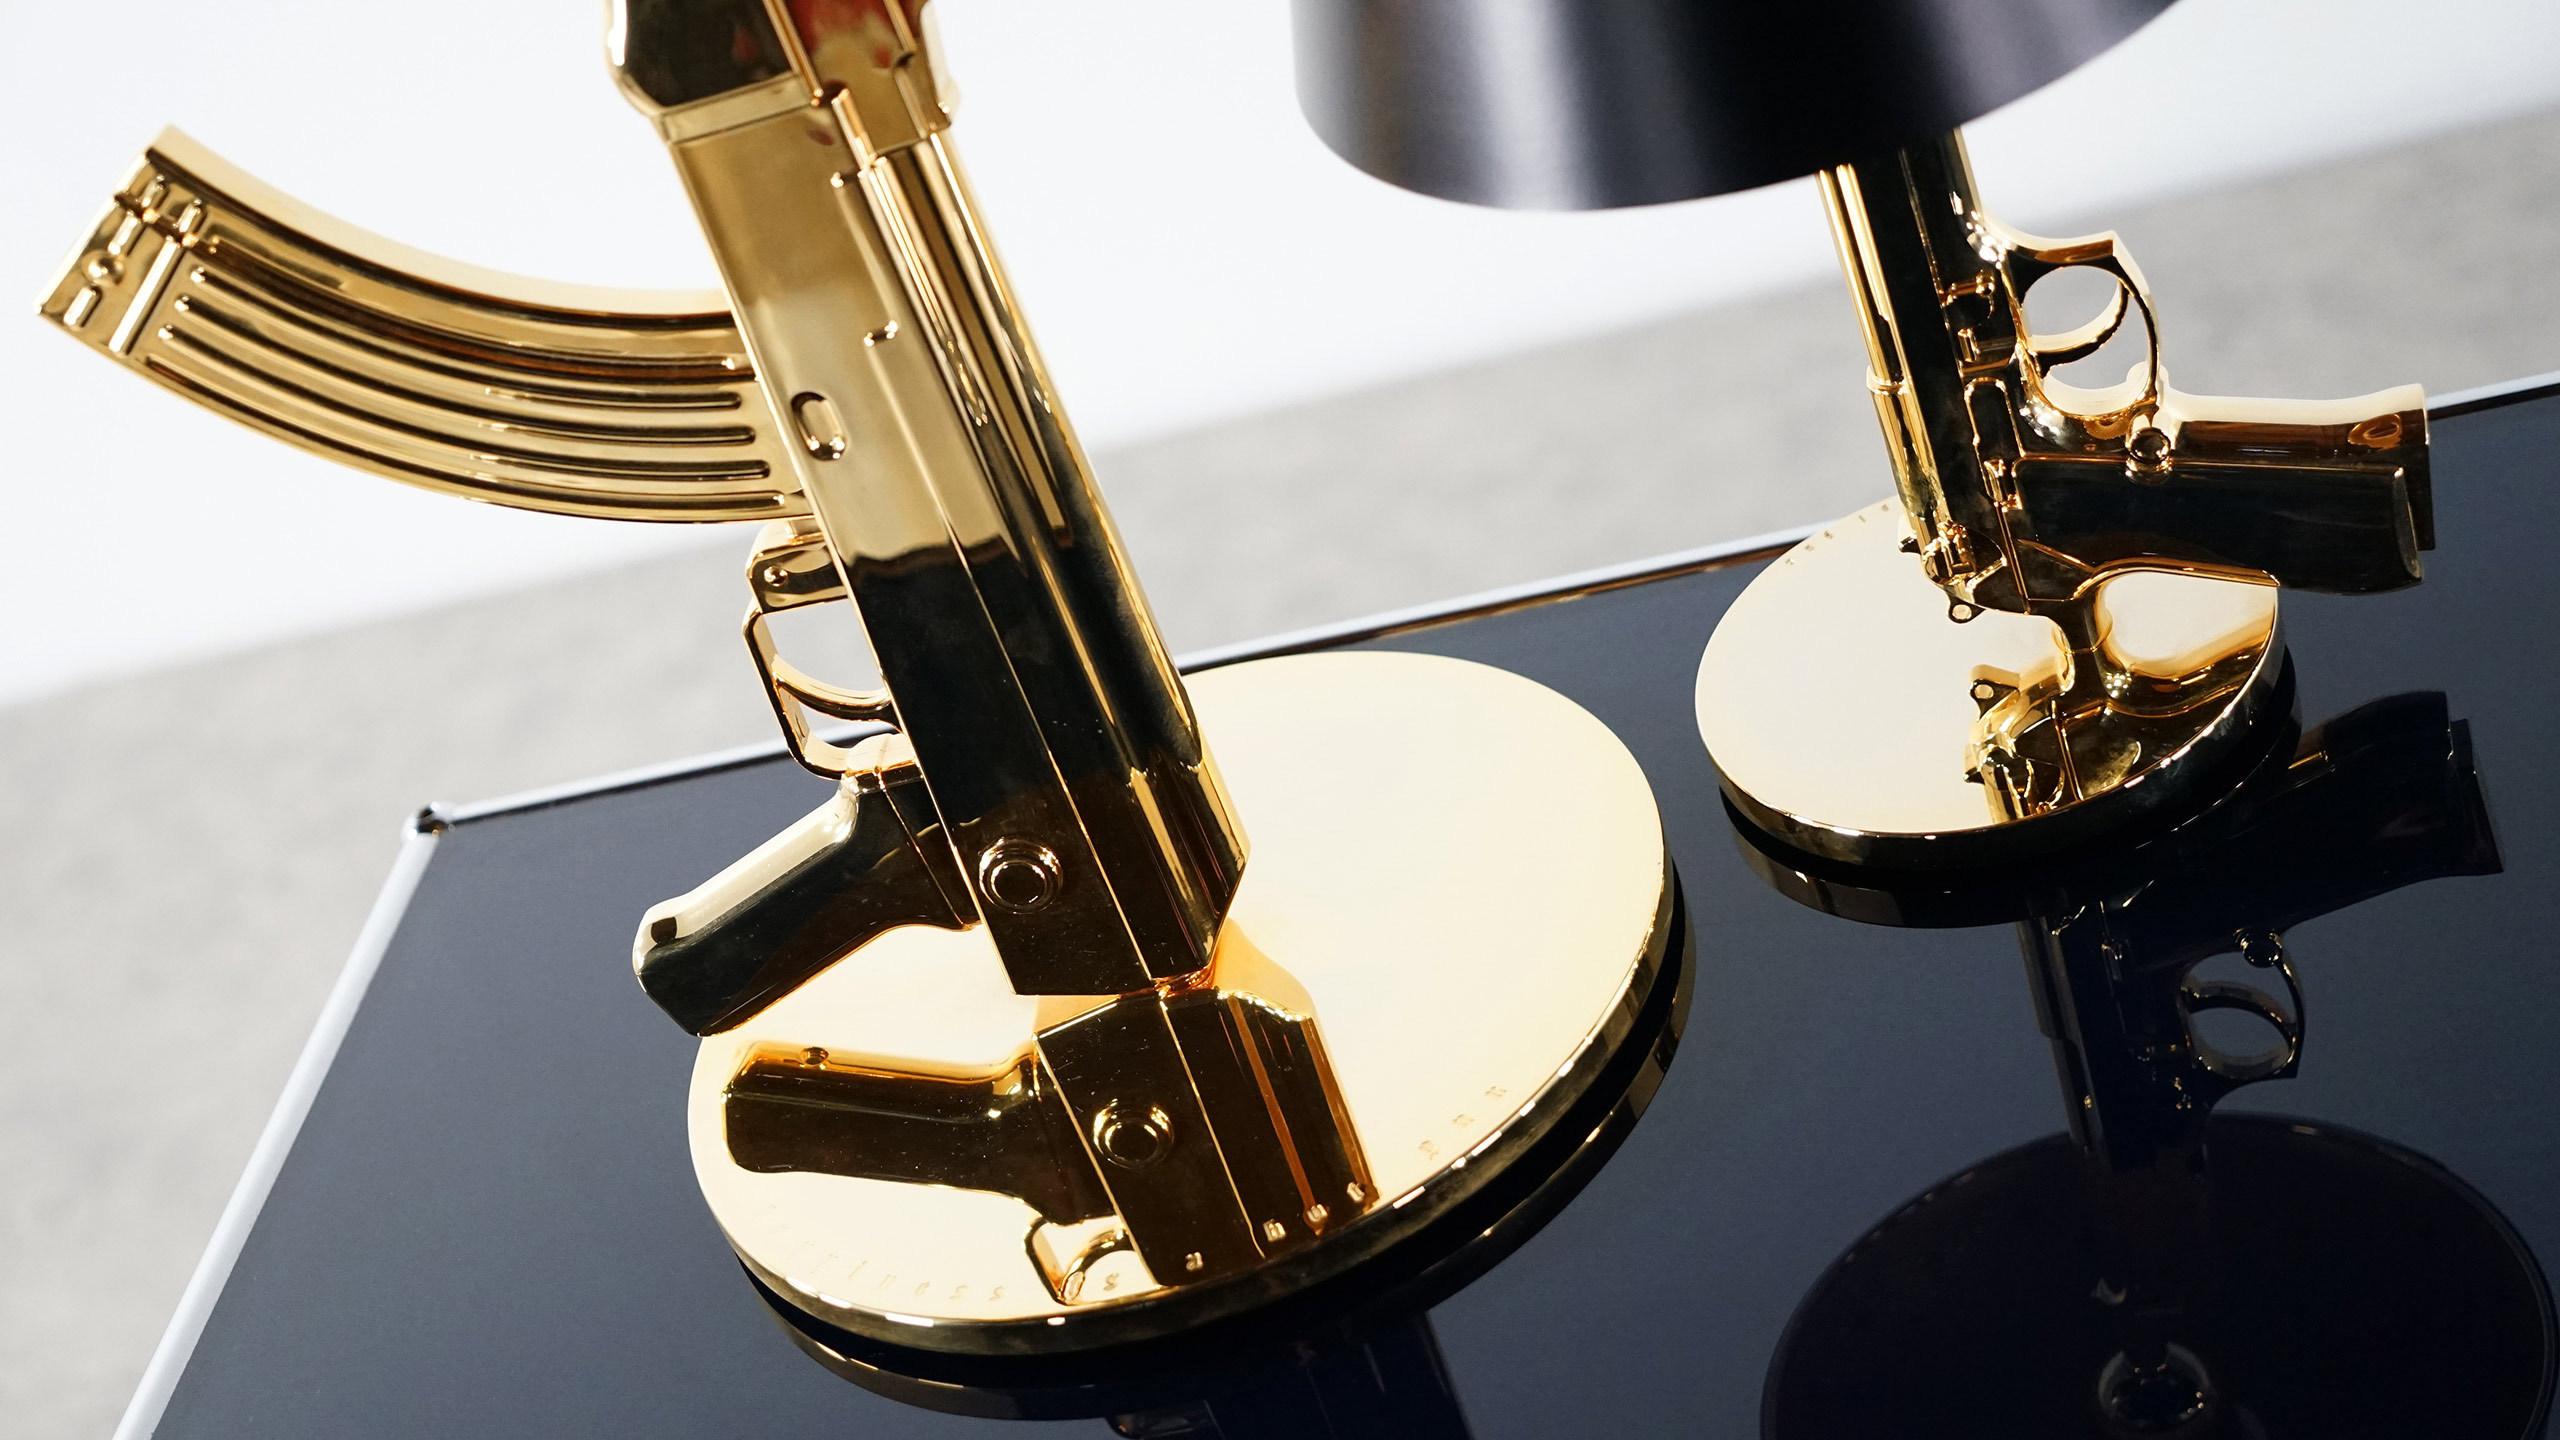 Philippe Starck Gun Lamp For Flos Bedside Gun Table Gun